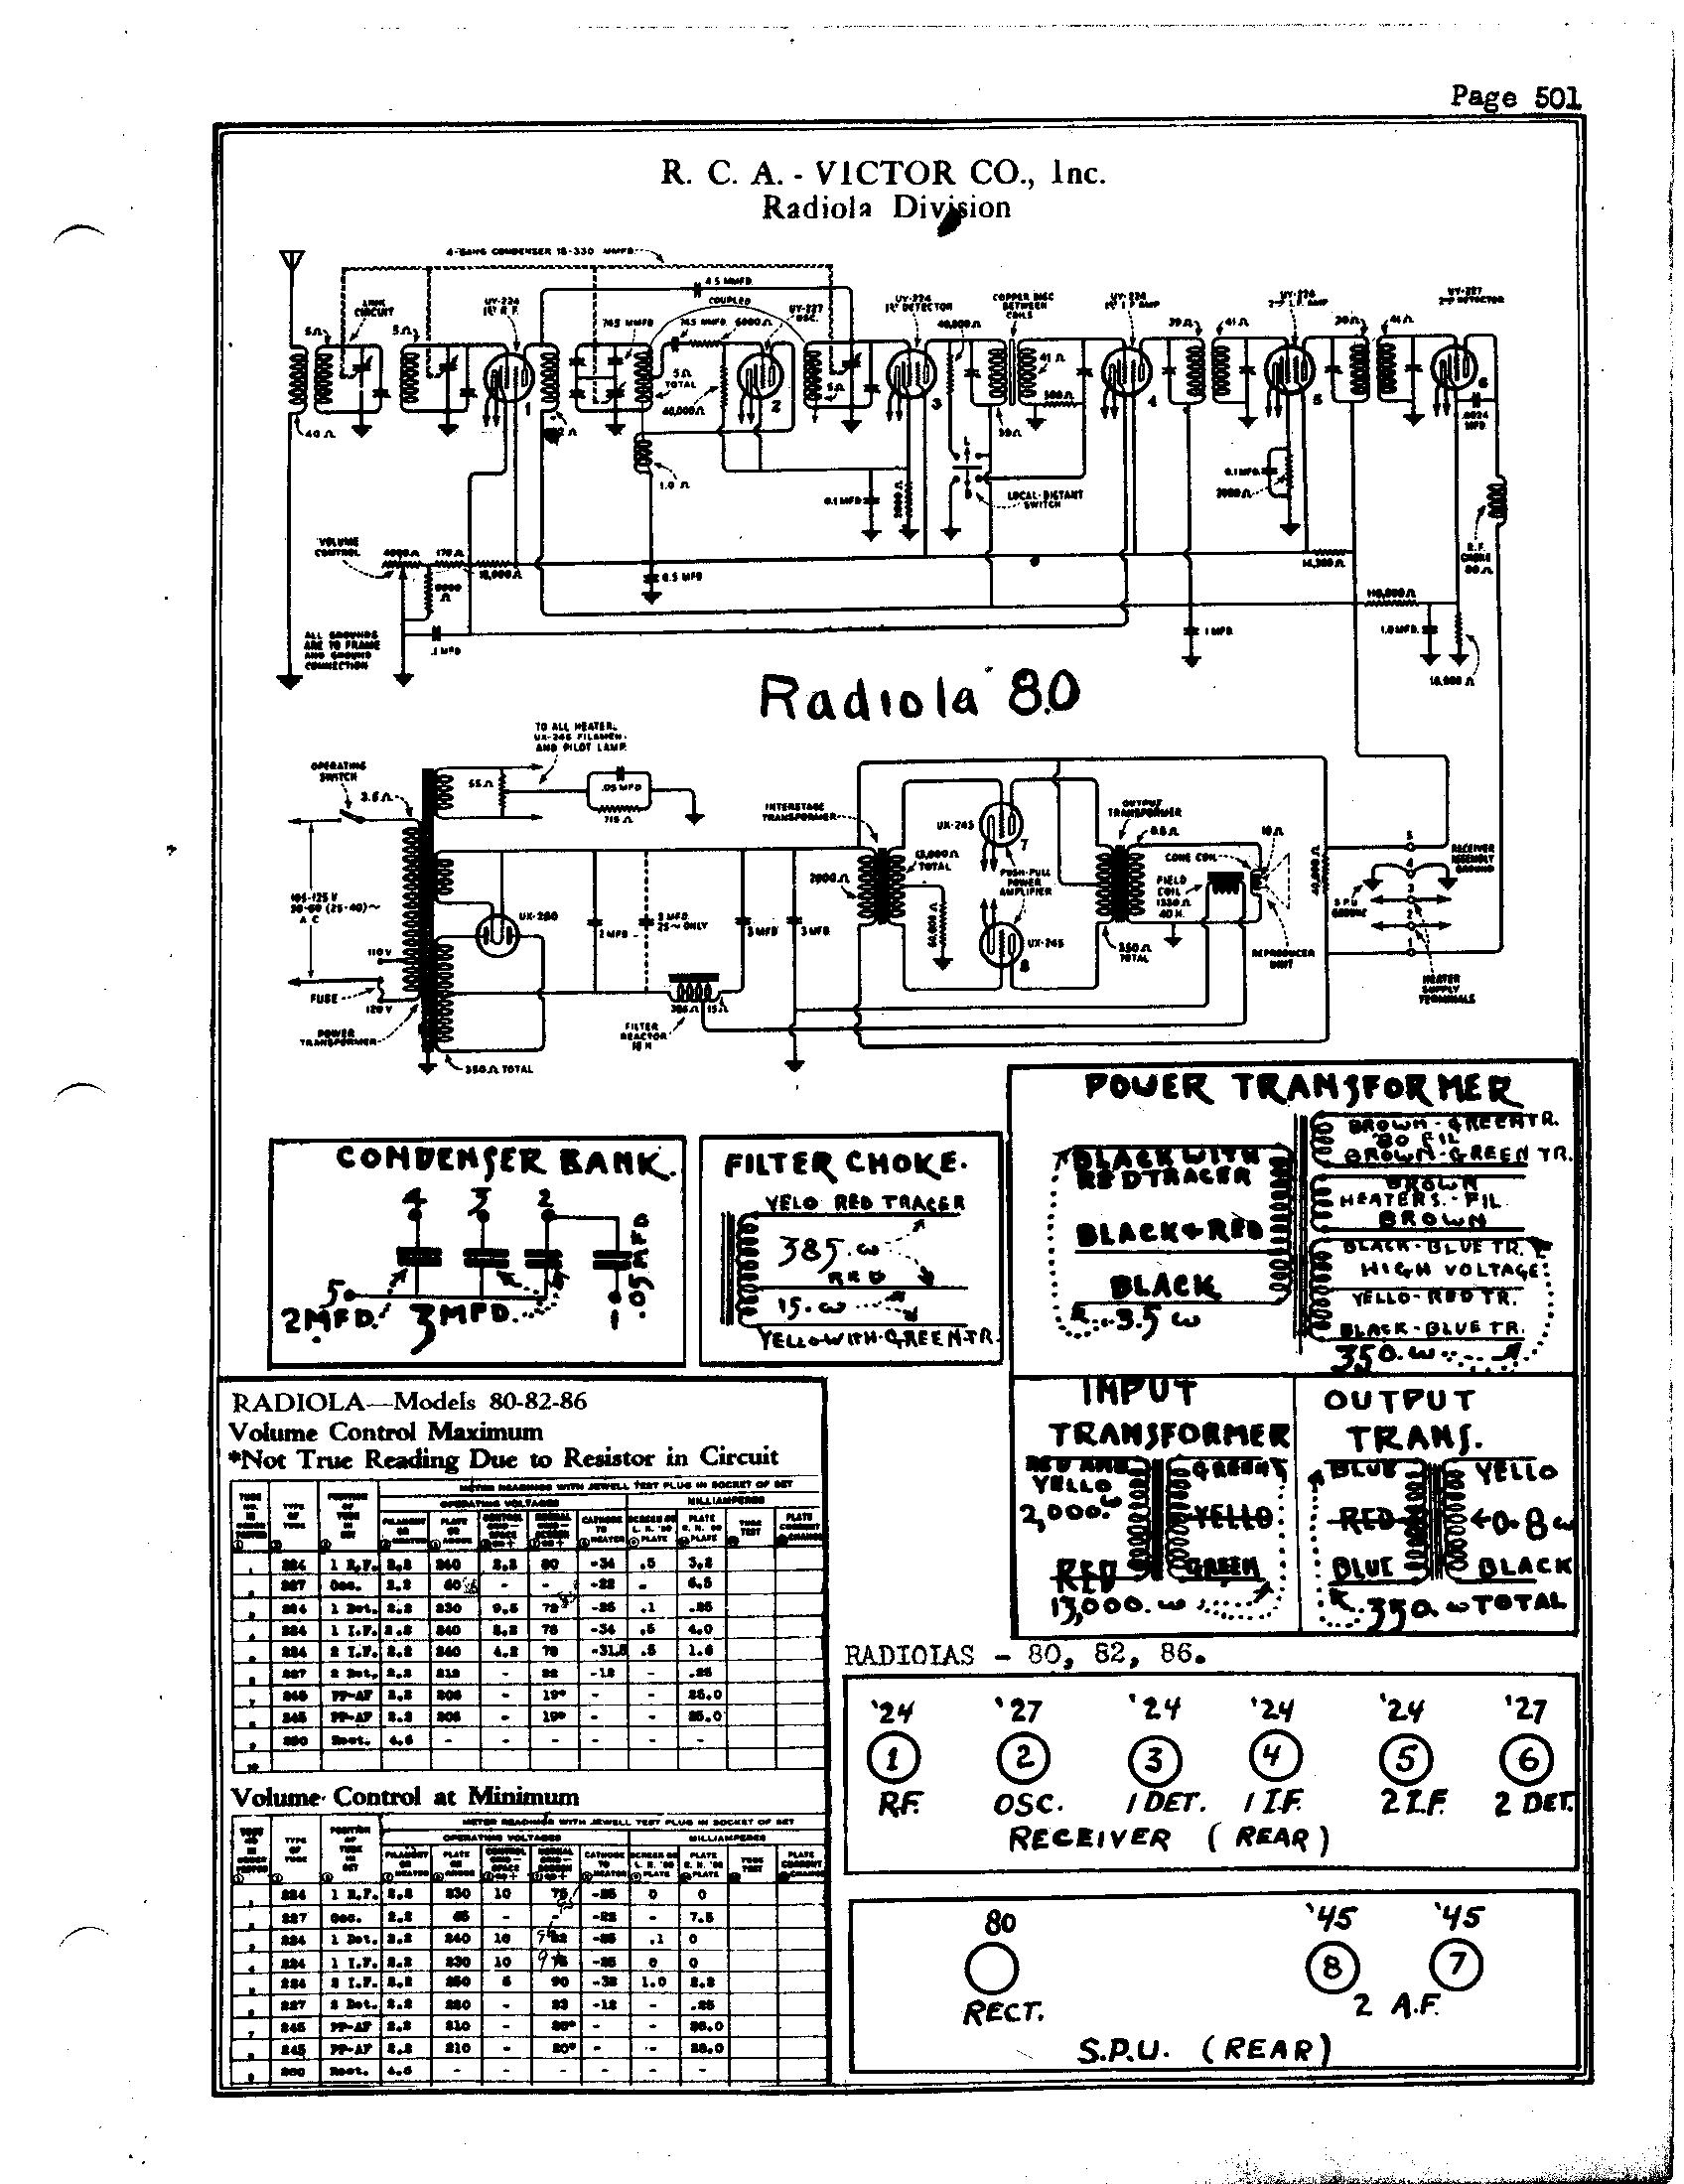 RCA Victor Co., Inc. Radiola 86 Schematic